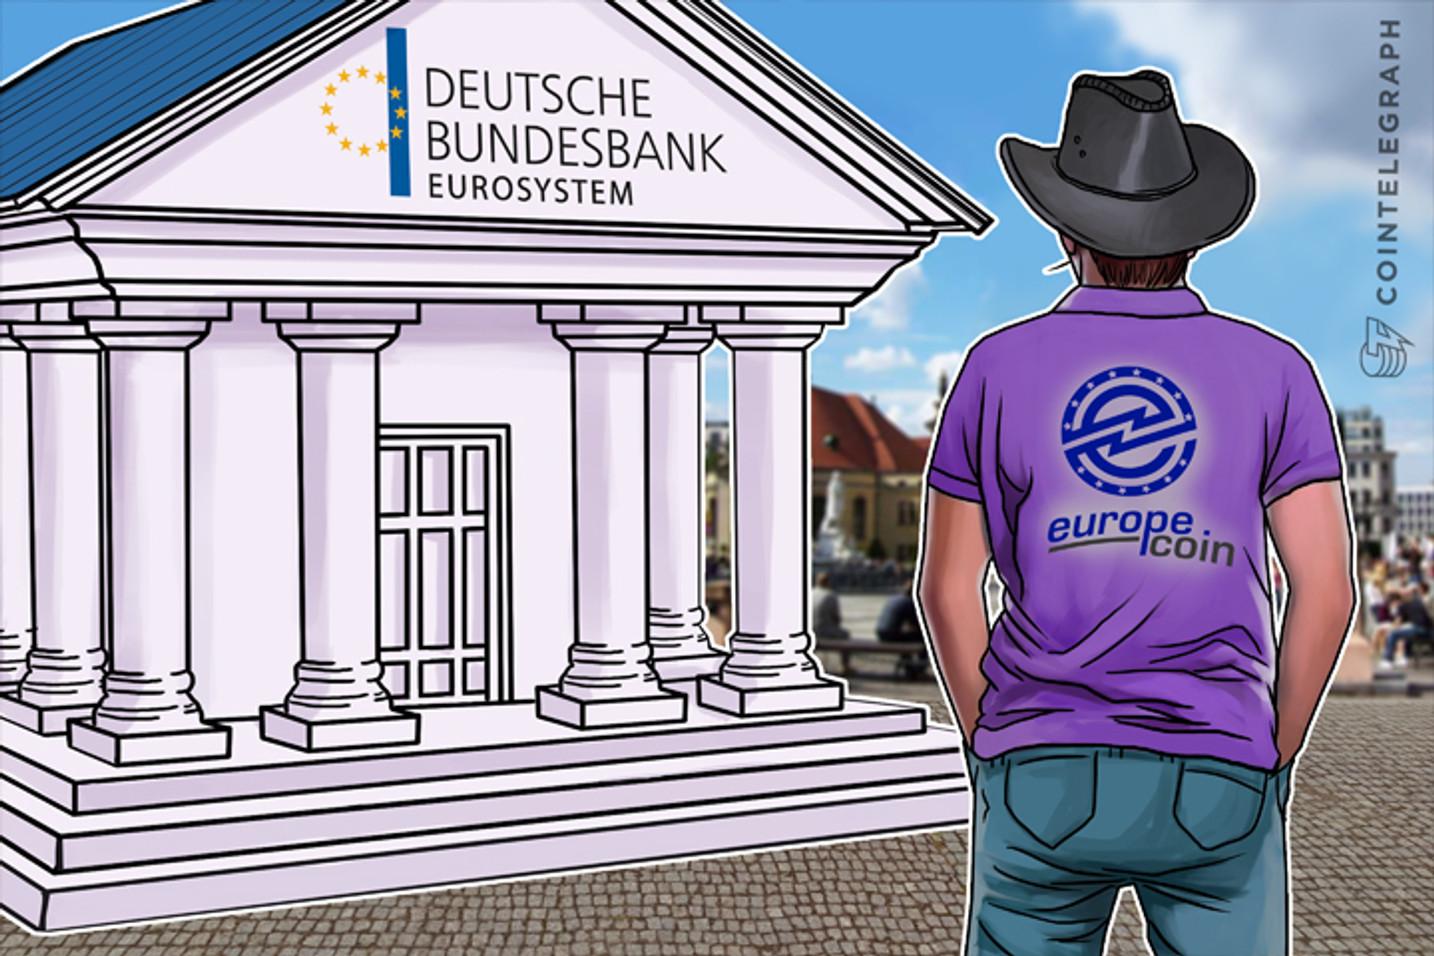 Banks Should Embrace Blockchain, Not Oppose It: Matthias Klees